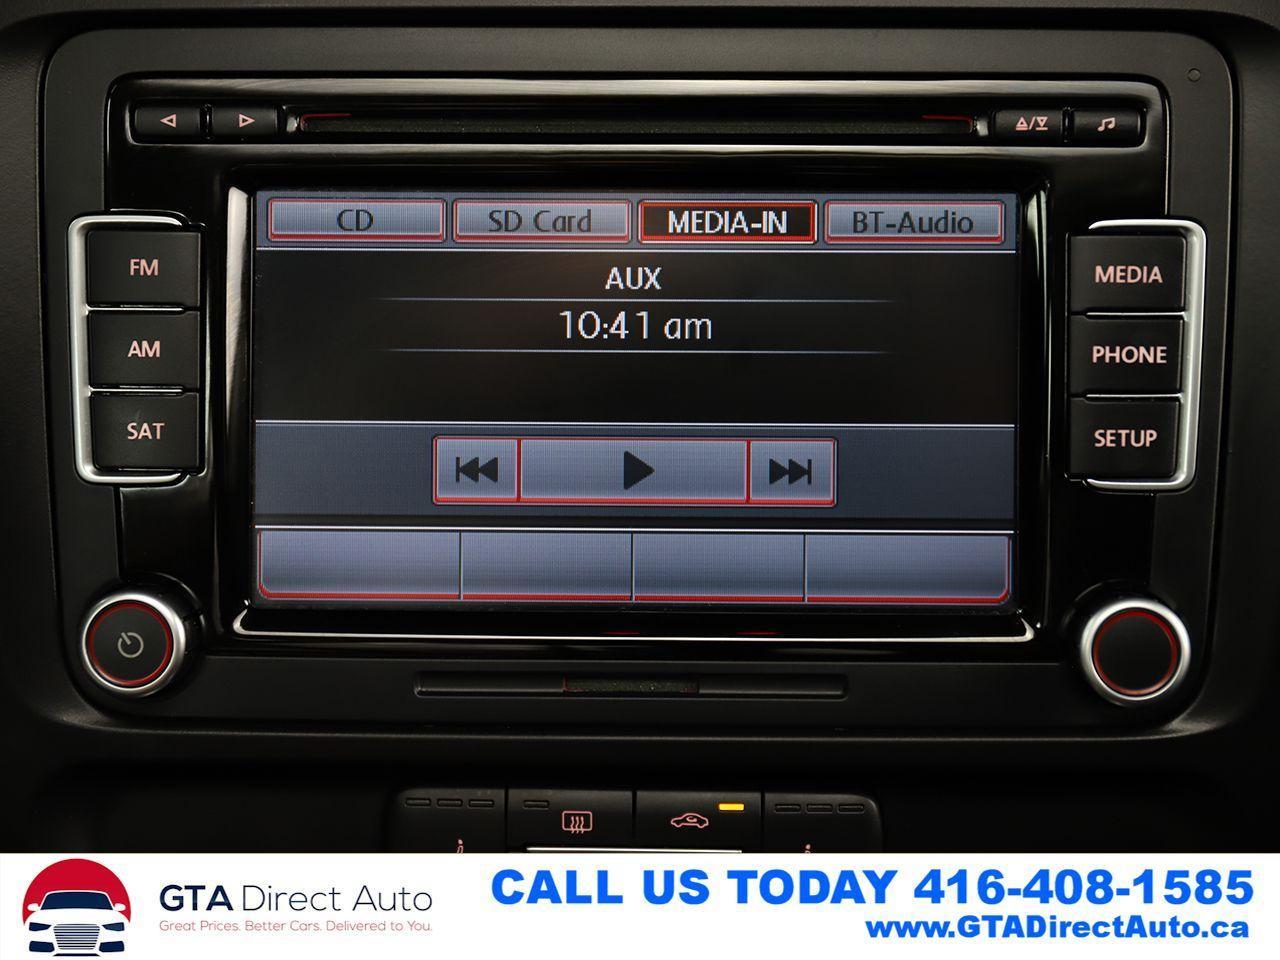 2013 Volkswagen Jetta in York | GTA Direct Auto